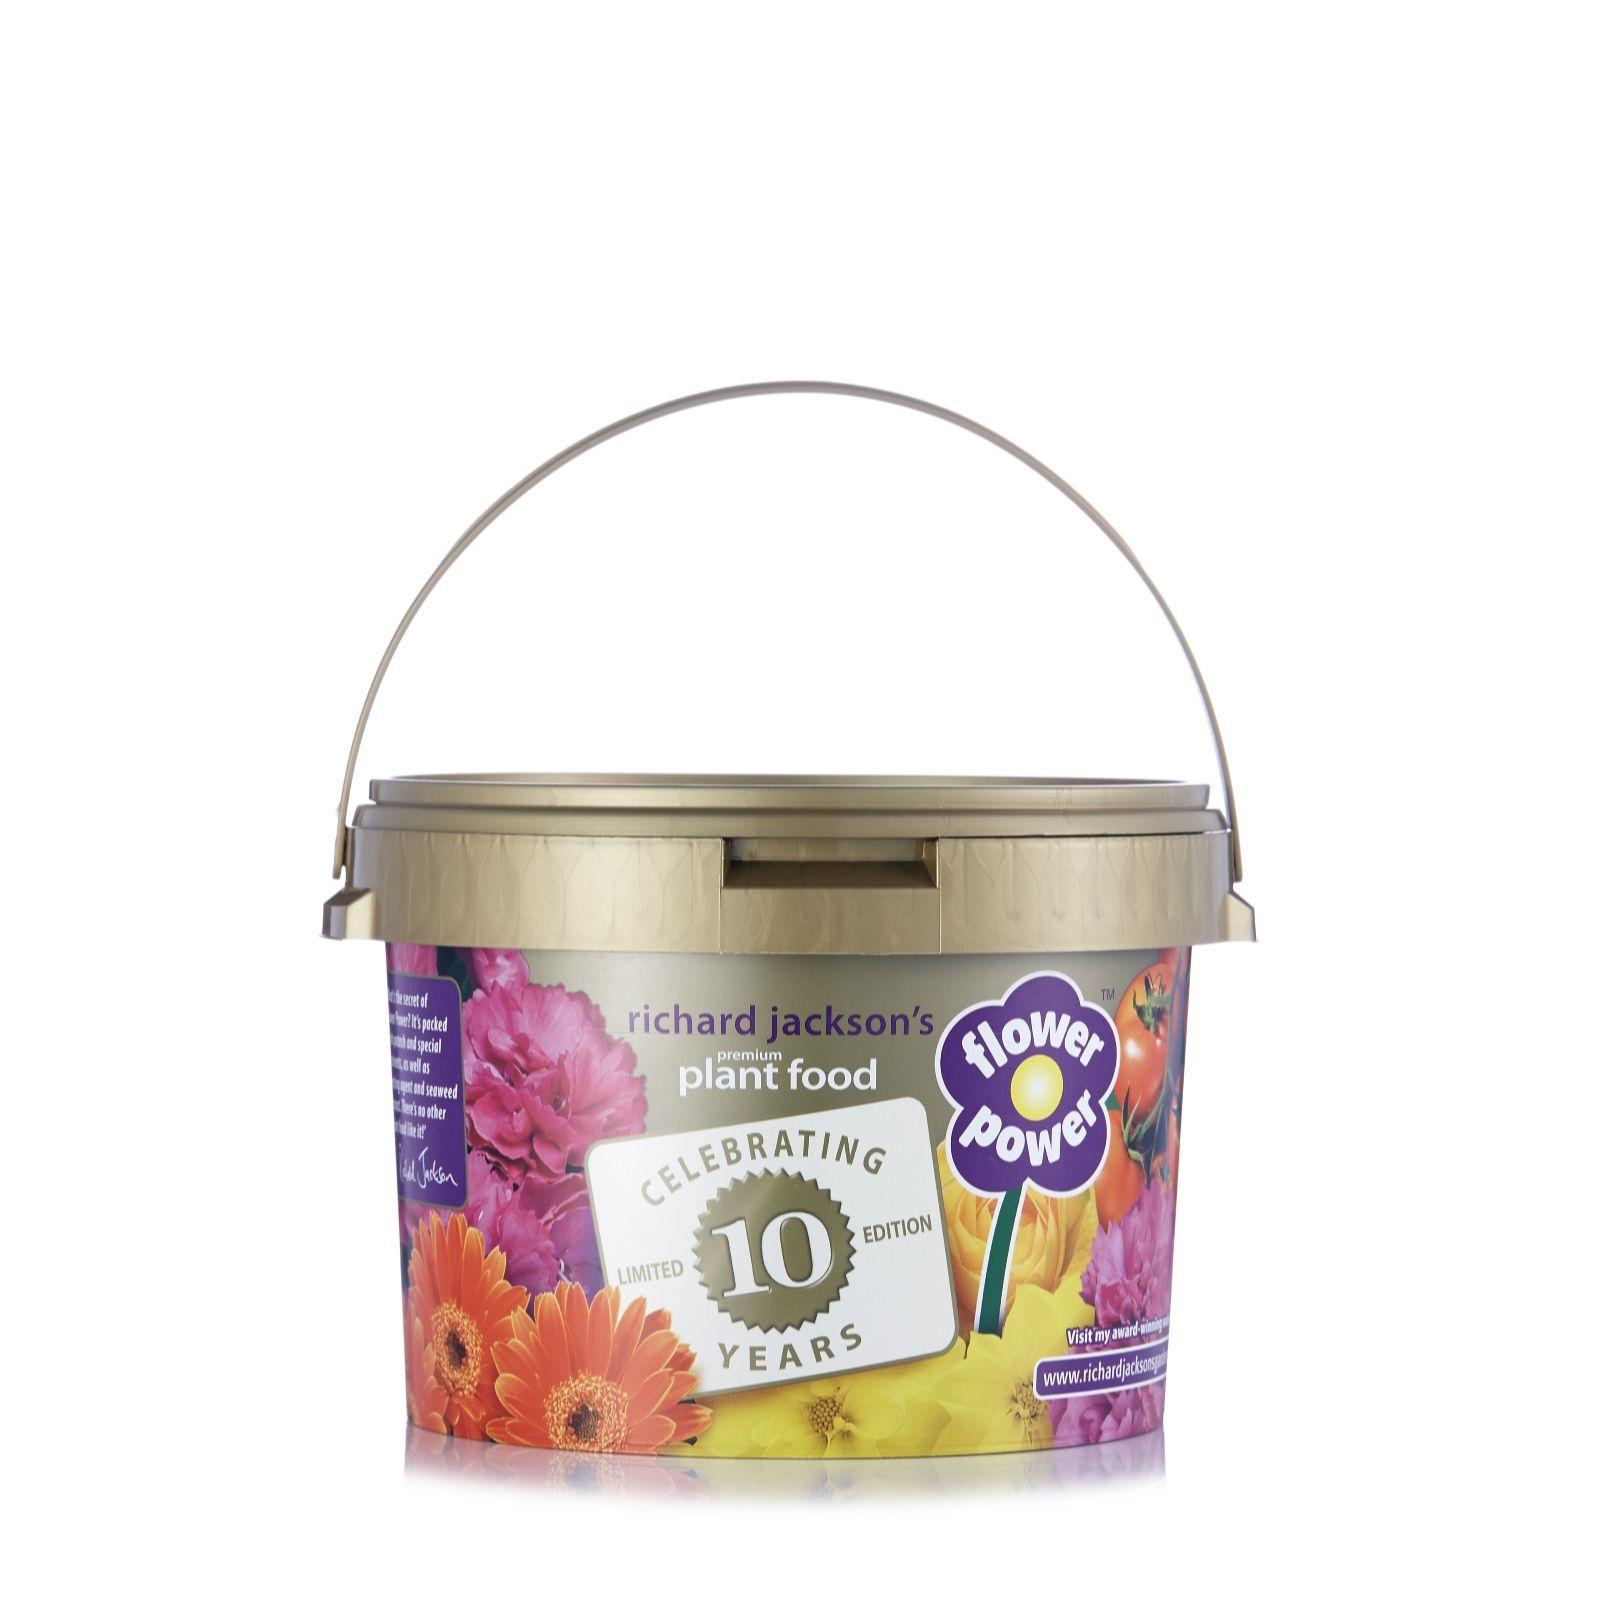 Richard Jacksonu0027s Flower Power 10th Anniversary 2.4kg Premium Plant Food    509000